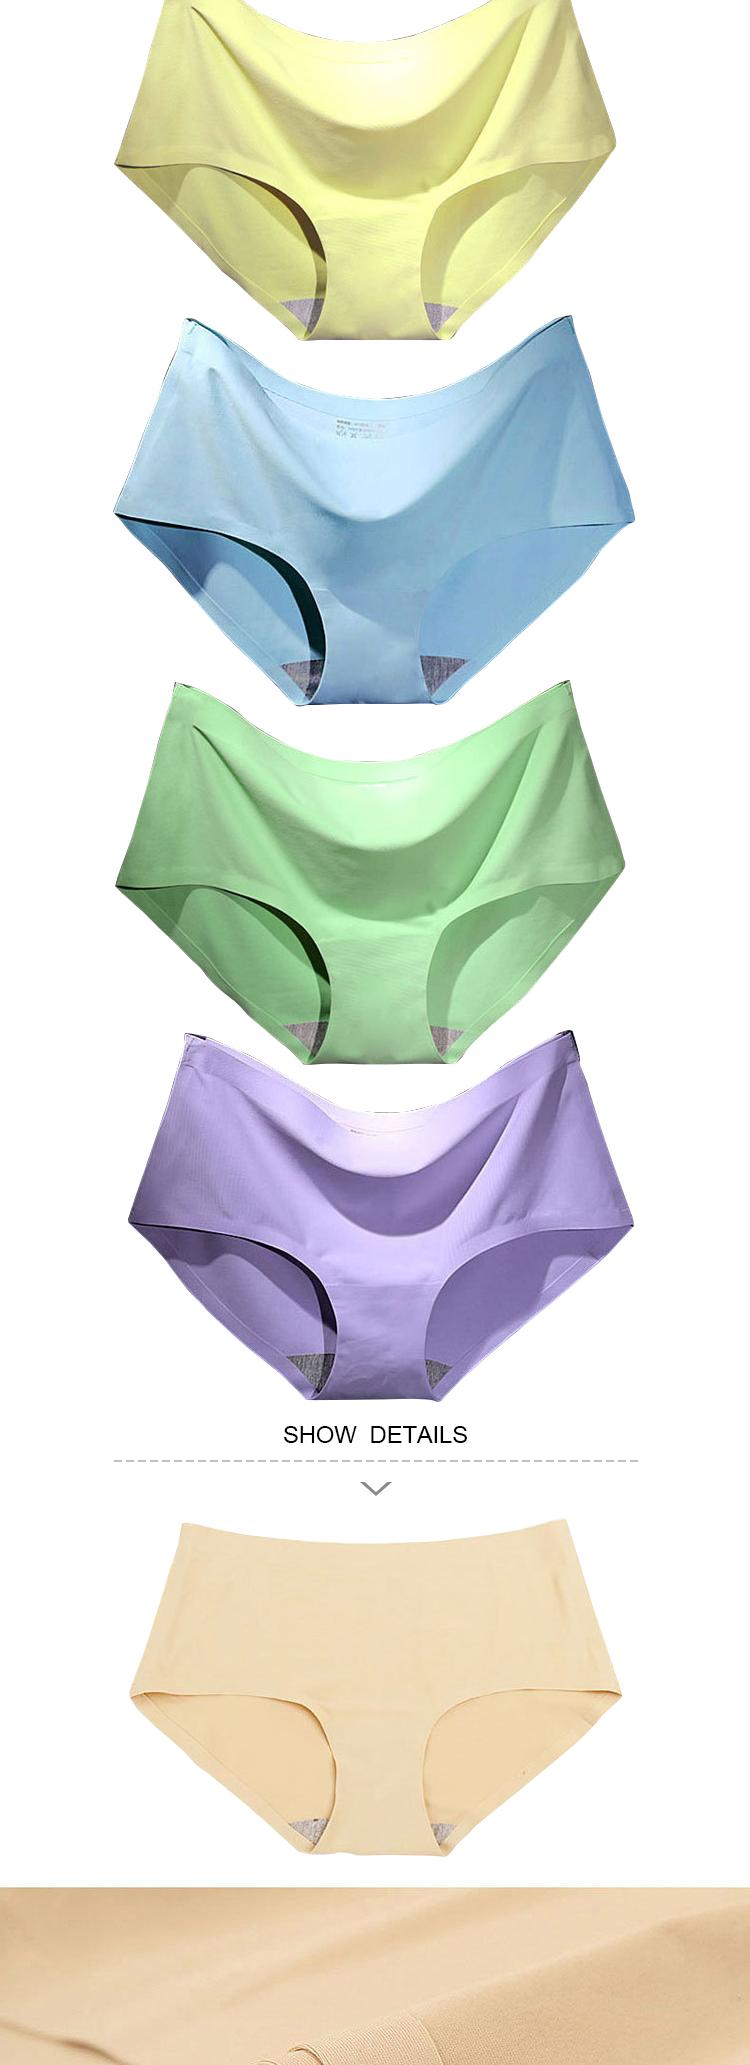 ad90249ef4 HSZ-006 Lingerie sexy transparent lady fancy panty set garter belt  wholesale 2017